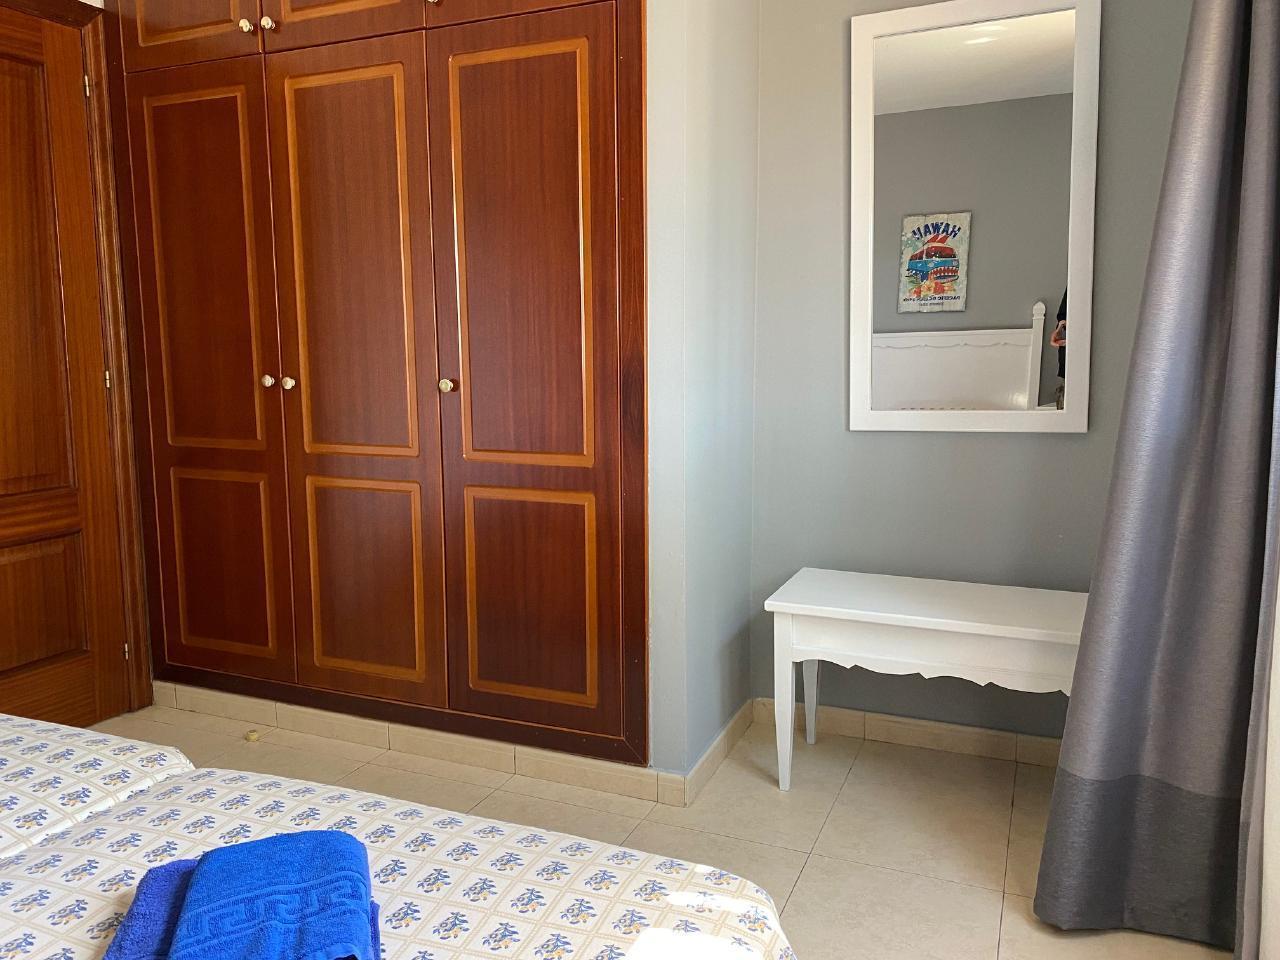 Ferienwohnung Apartments RO Corralejo (II) (431498), Corralejo, Fuerteventura, Kanarische Inseln, Spanien, Bild 32